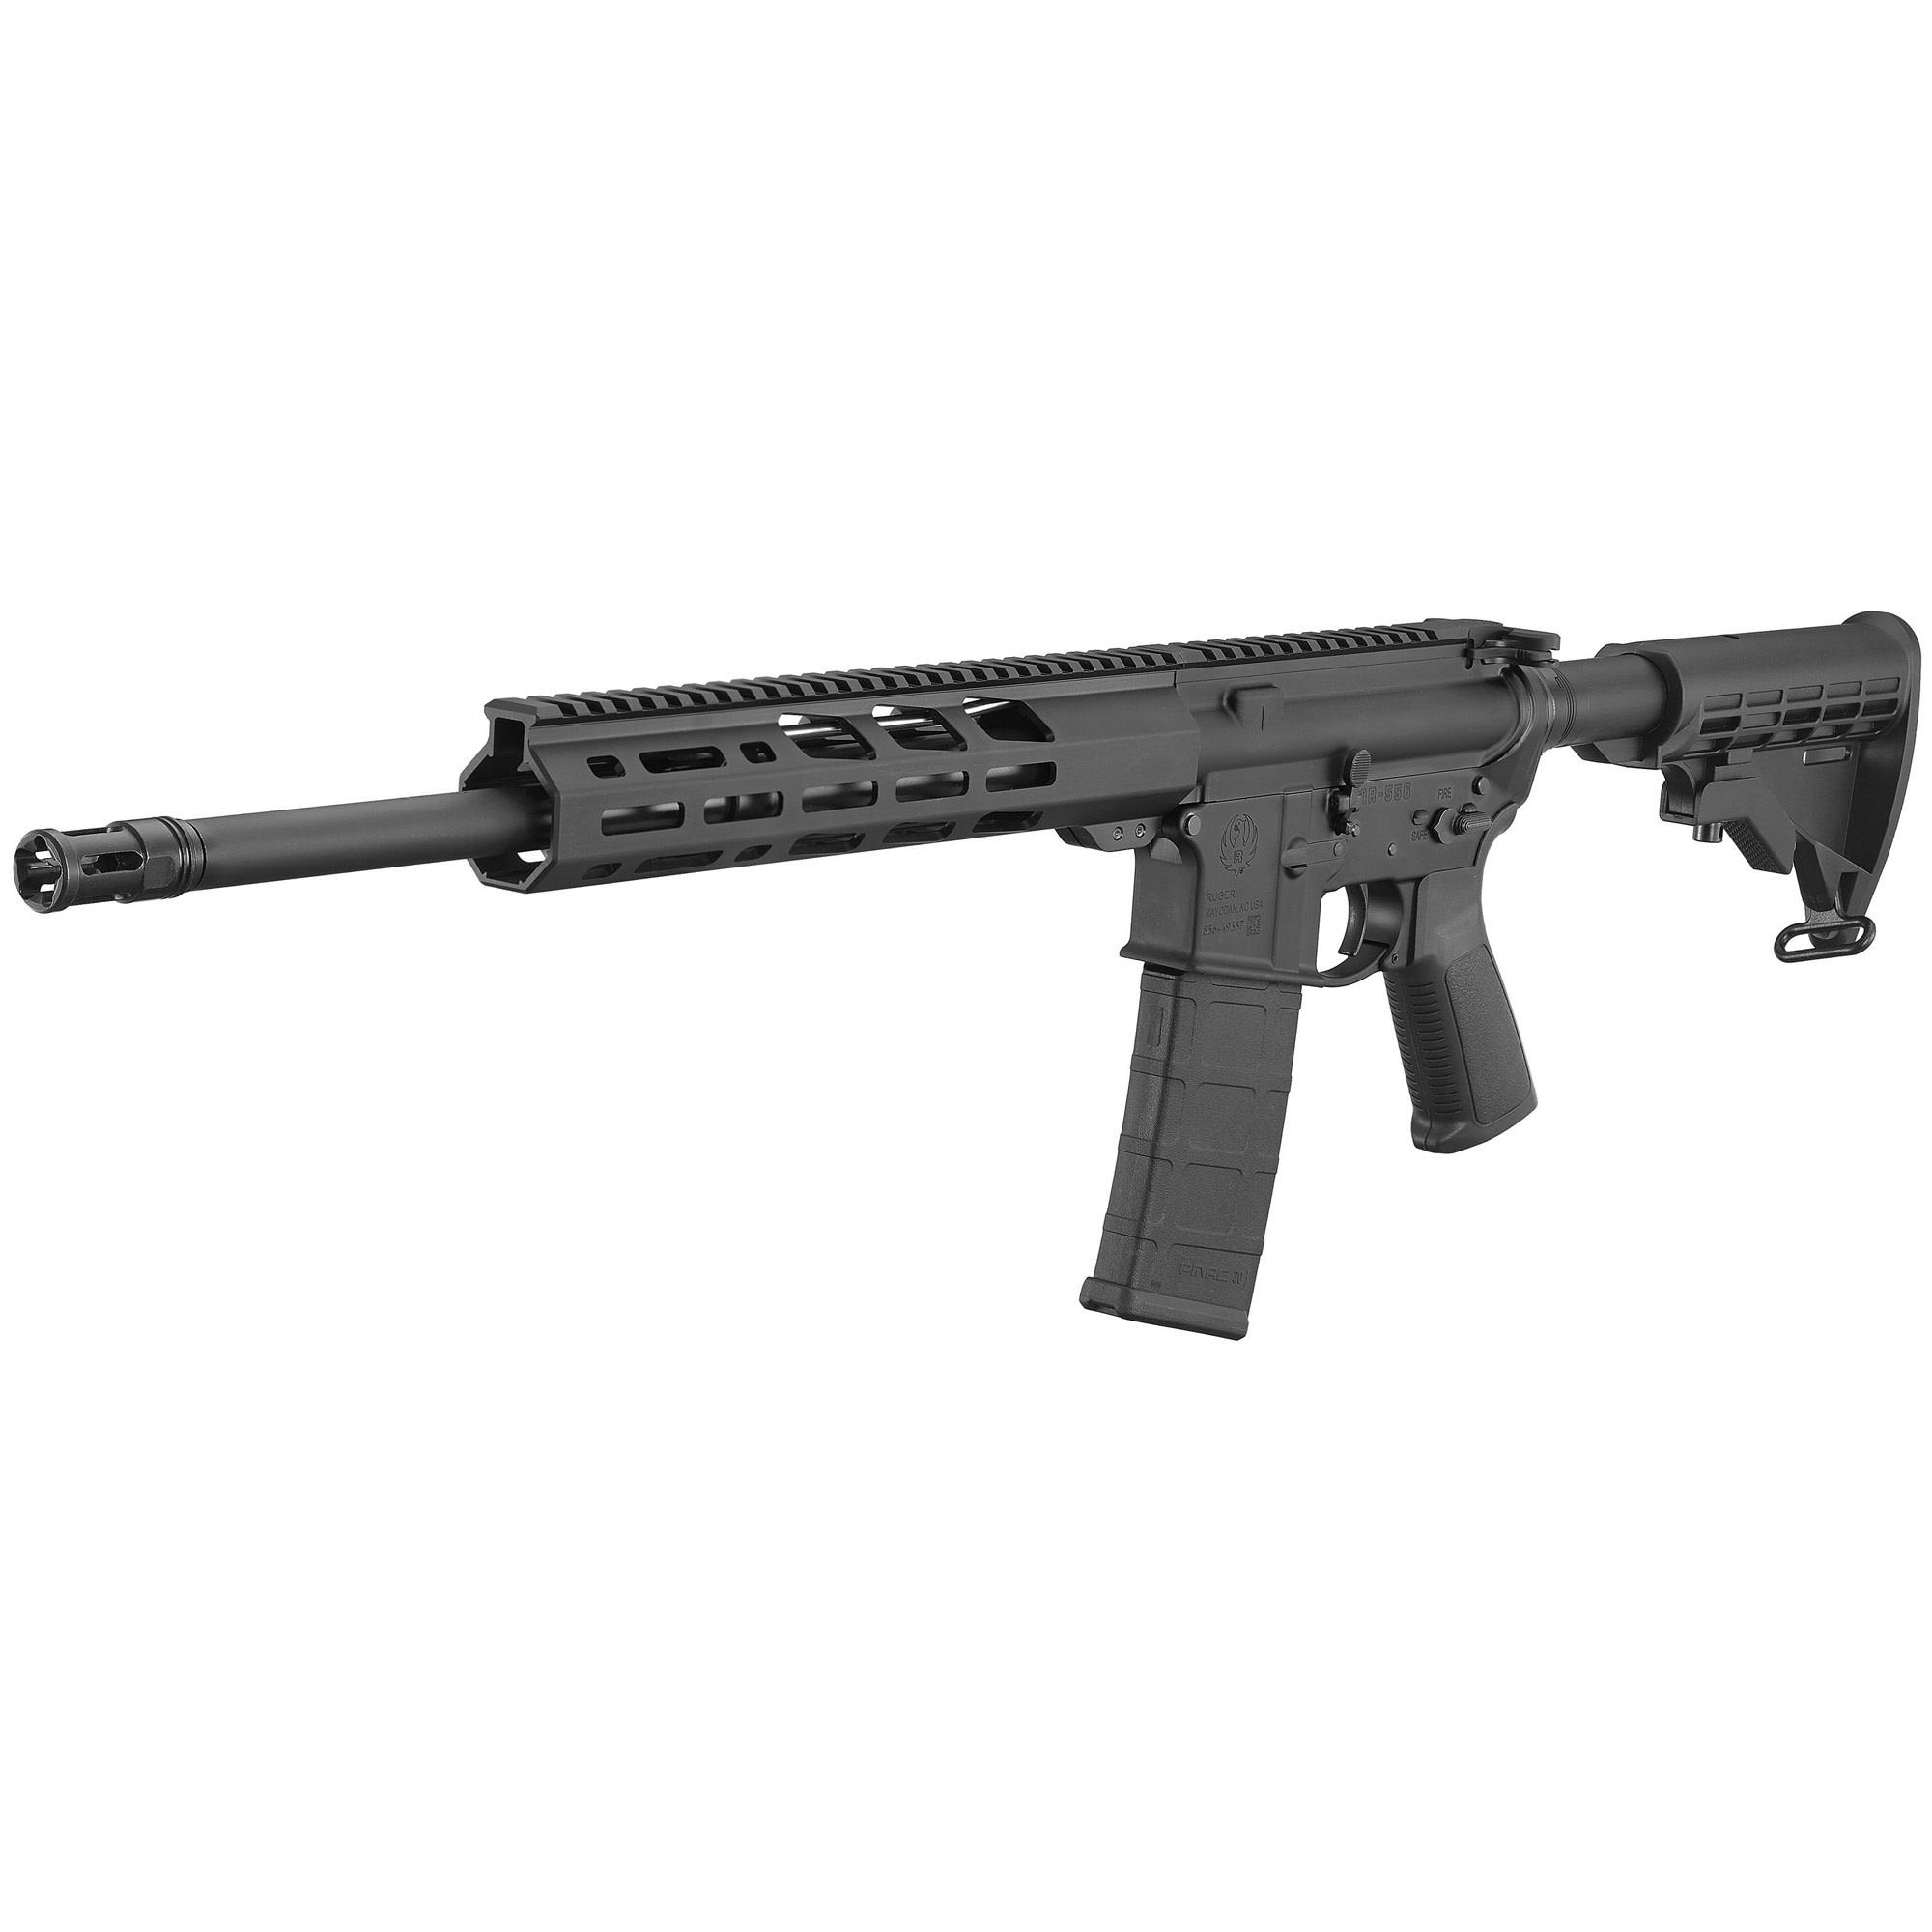 "Ruger AR-556, 223/556, 16.1"", Black, M-LOK Handguard, 1-30Rd Magazine"